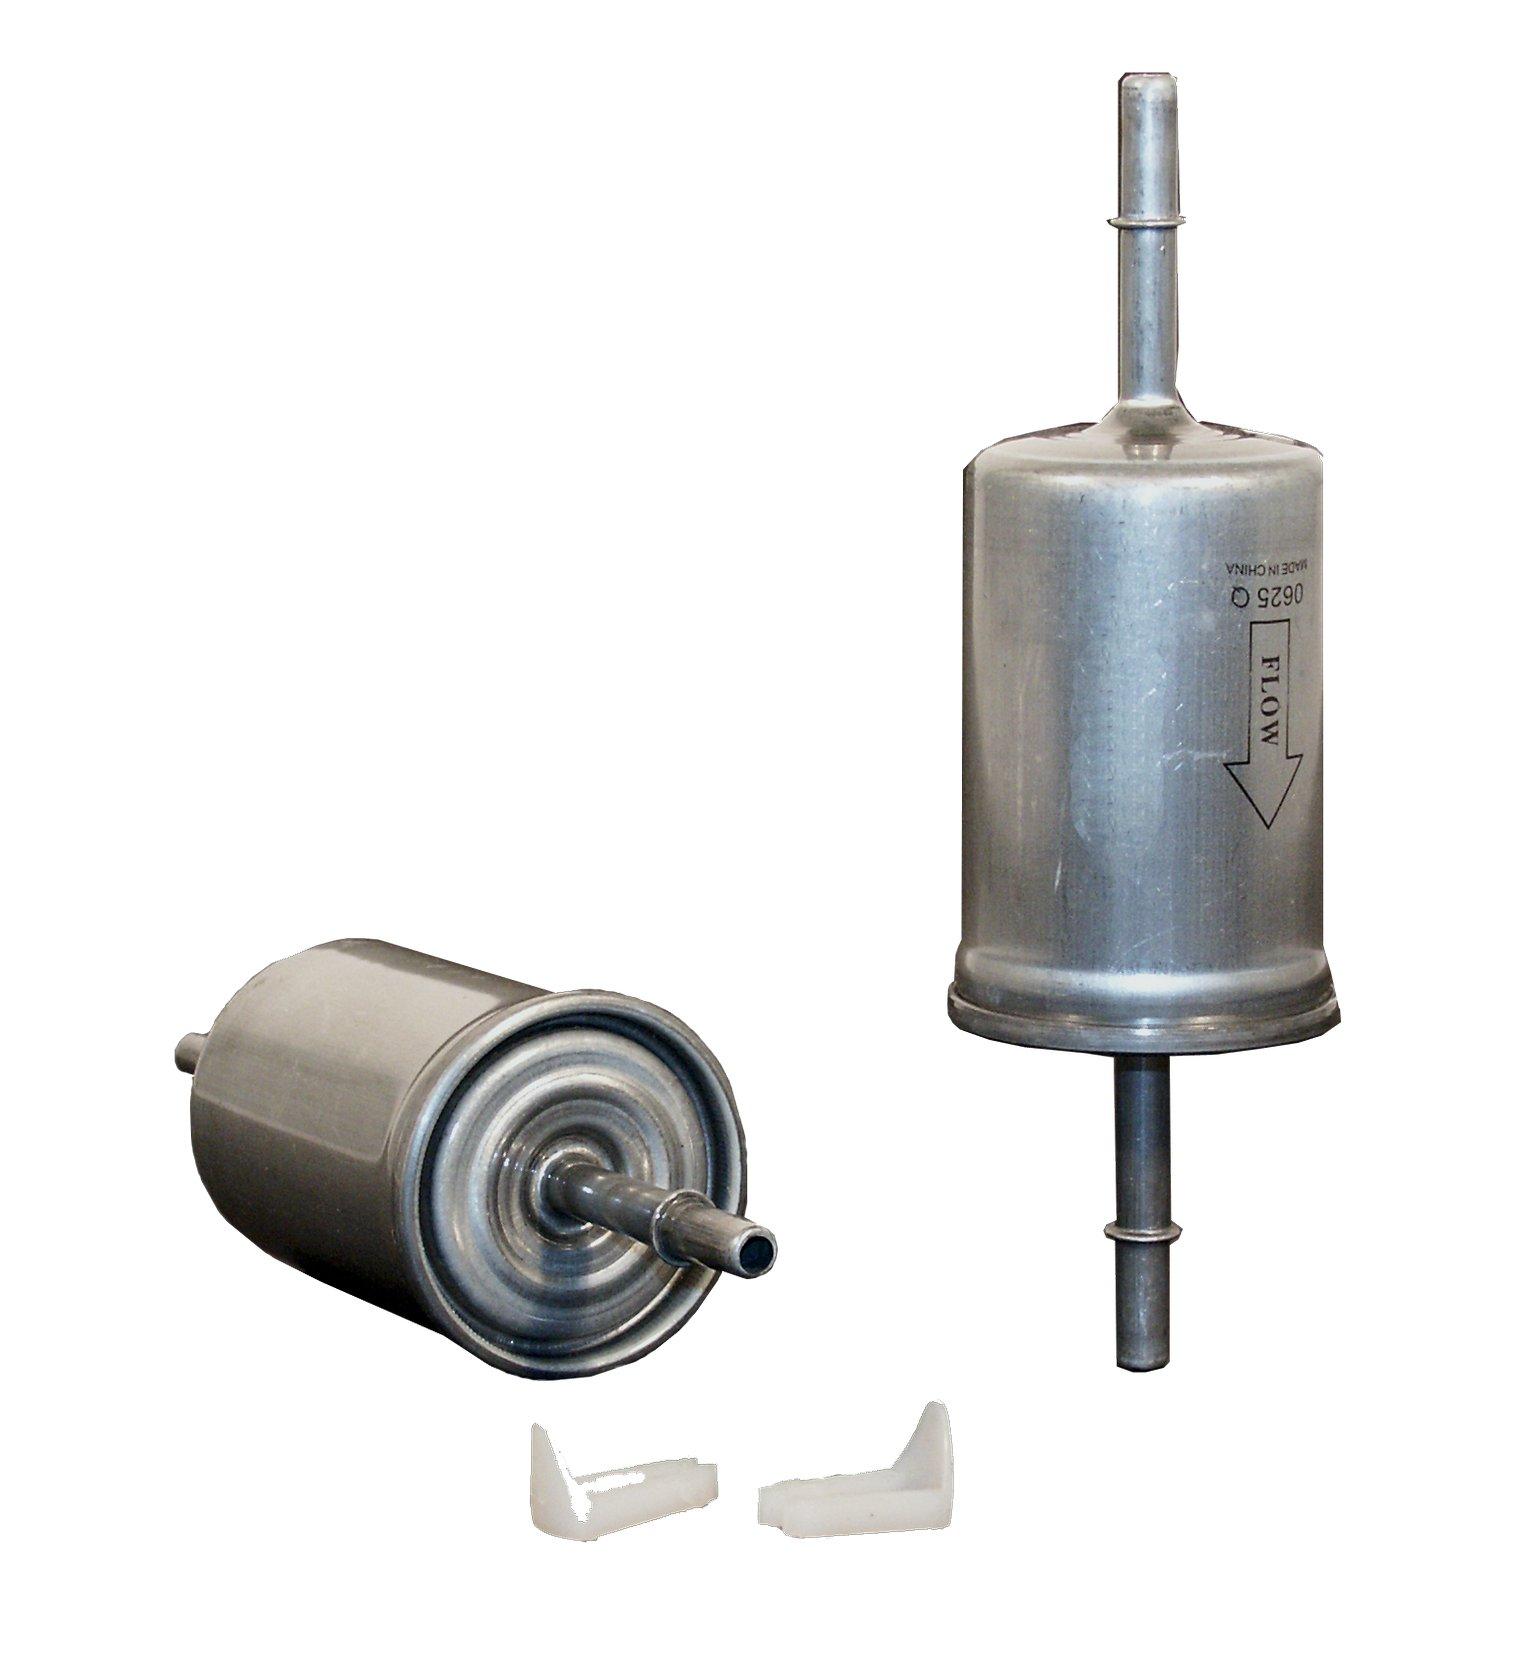 Fuel Filter Hastings GF326 Fram G8018 WIX 33704 BALDWIN BF7668 BF7768 NAPA 3595